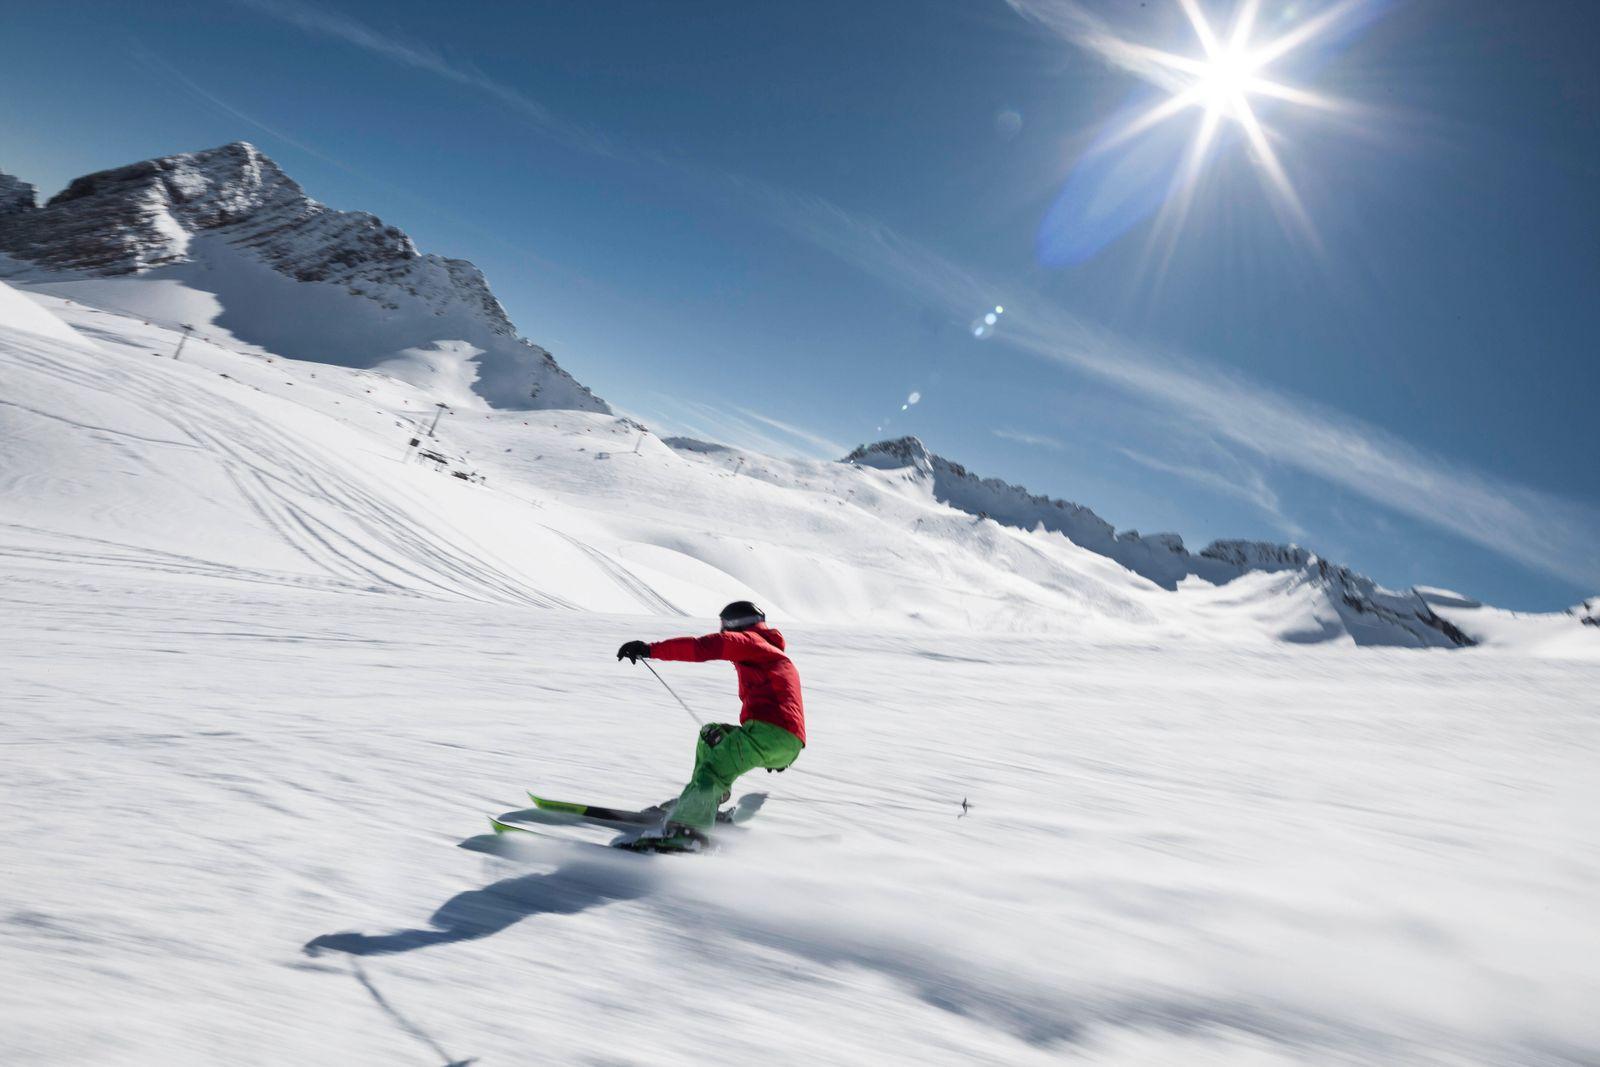 Germany, Bavaria, Garmisch-Partenkirchen, Sun shining over man skiing at Zugspitze model released Symbolfoto WFF00412